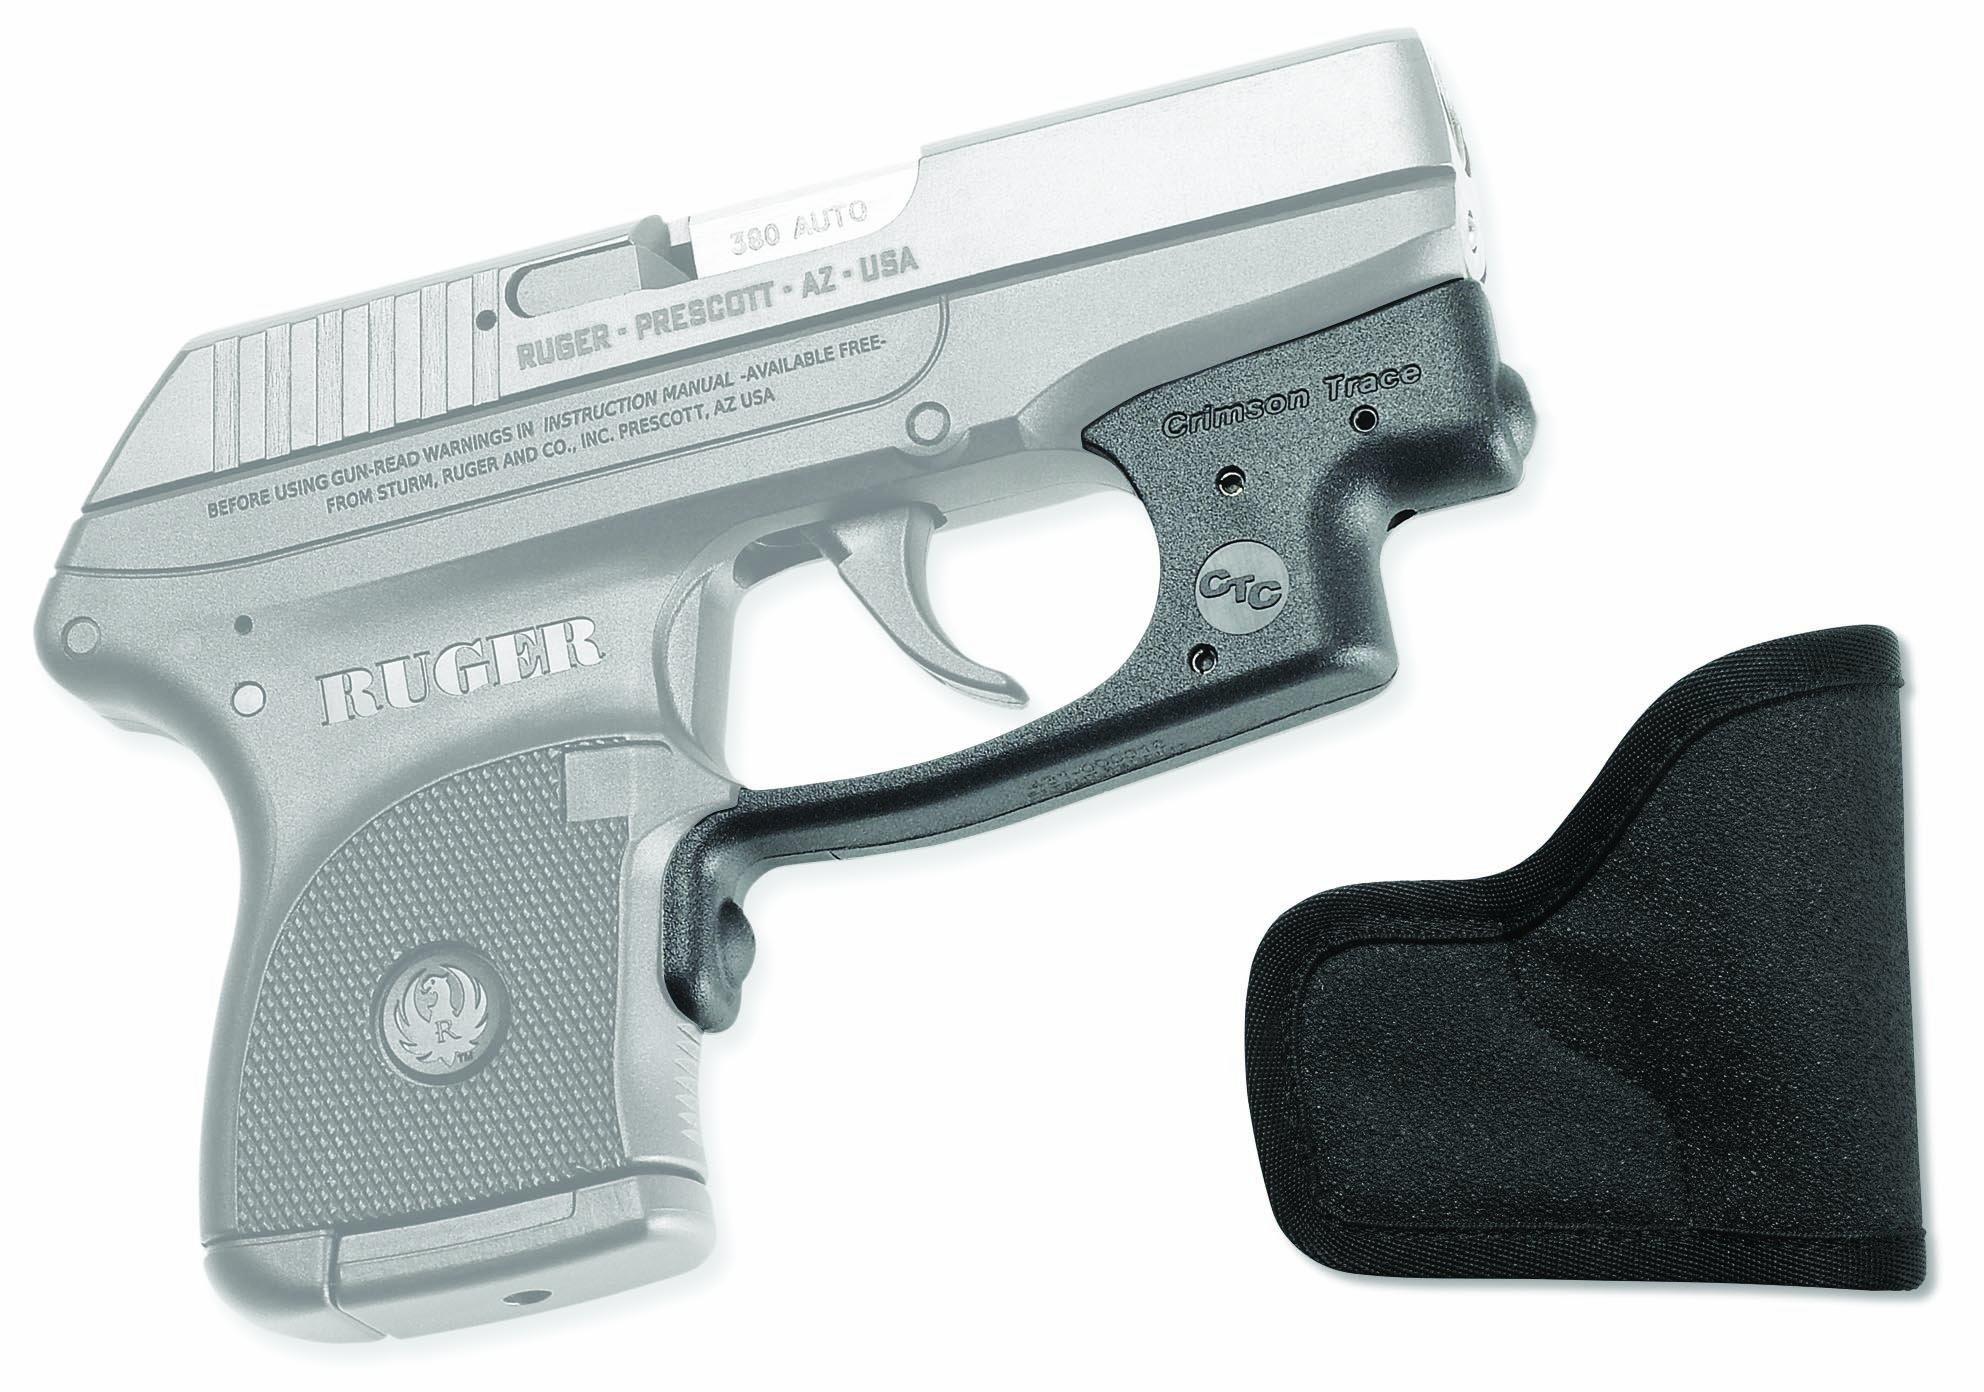 Crimson Trace LG-431 Laserguard Red Laser Sight for Ruger LCP Pistols with Pocket Holster